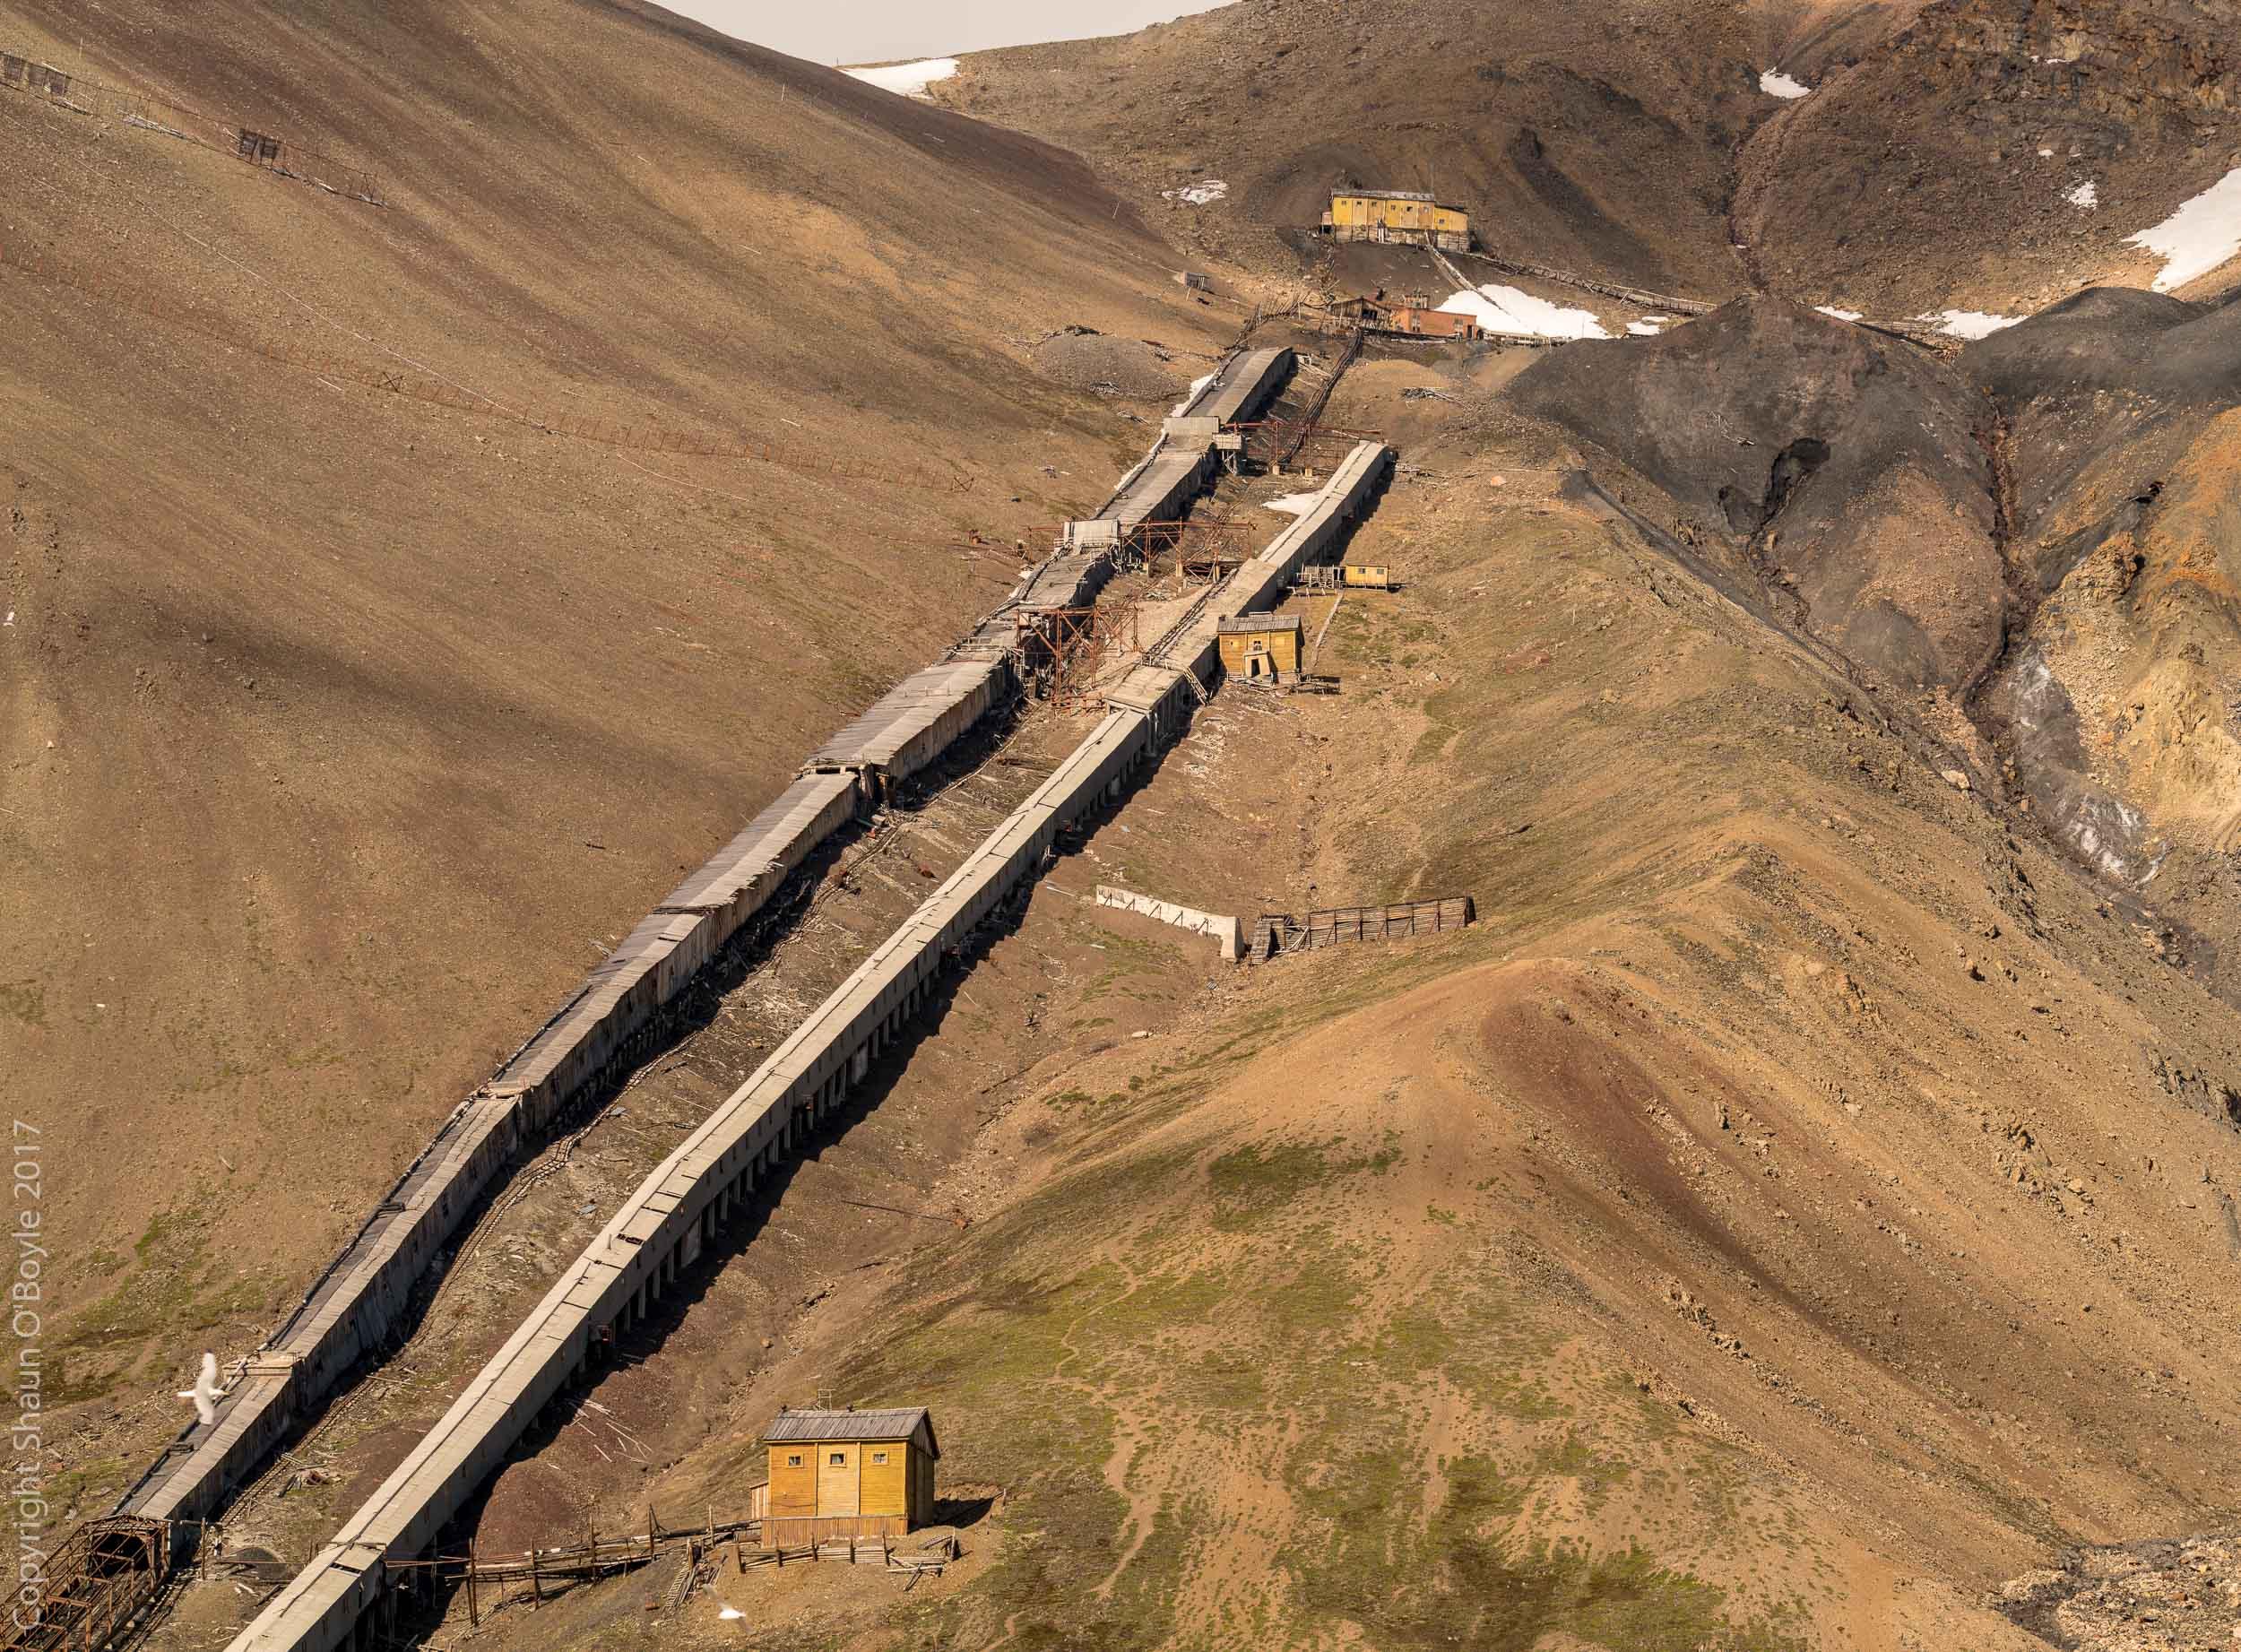 Tramway up Pyramiden Mountain to the coal mine entrances, Pyramiden, Svalbard